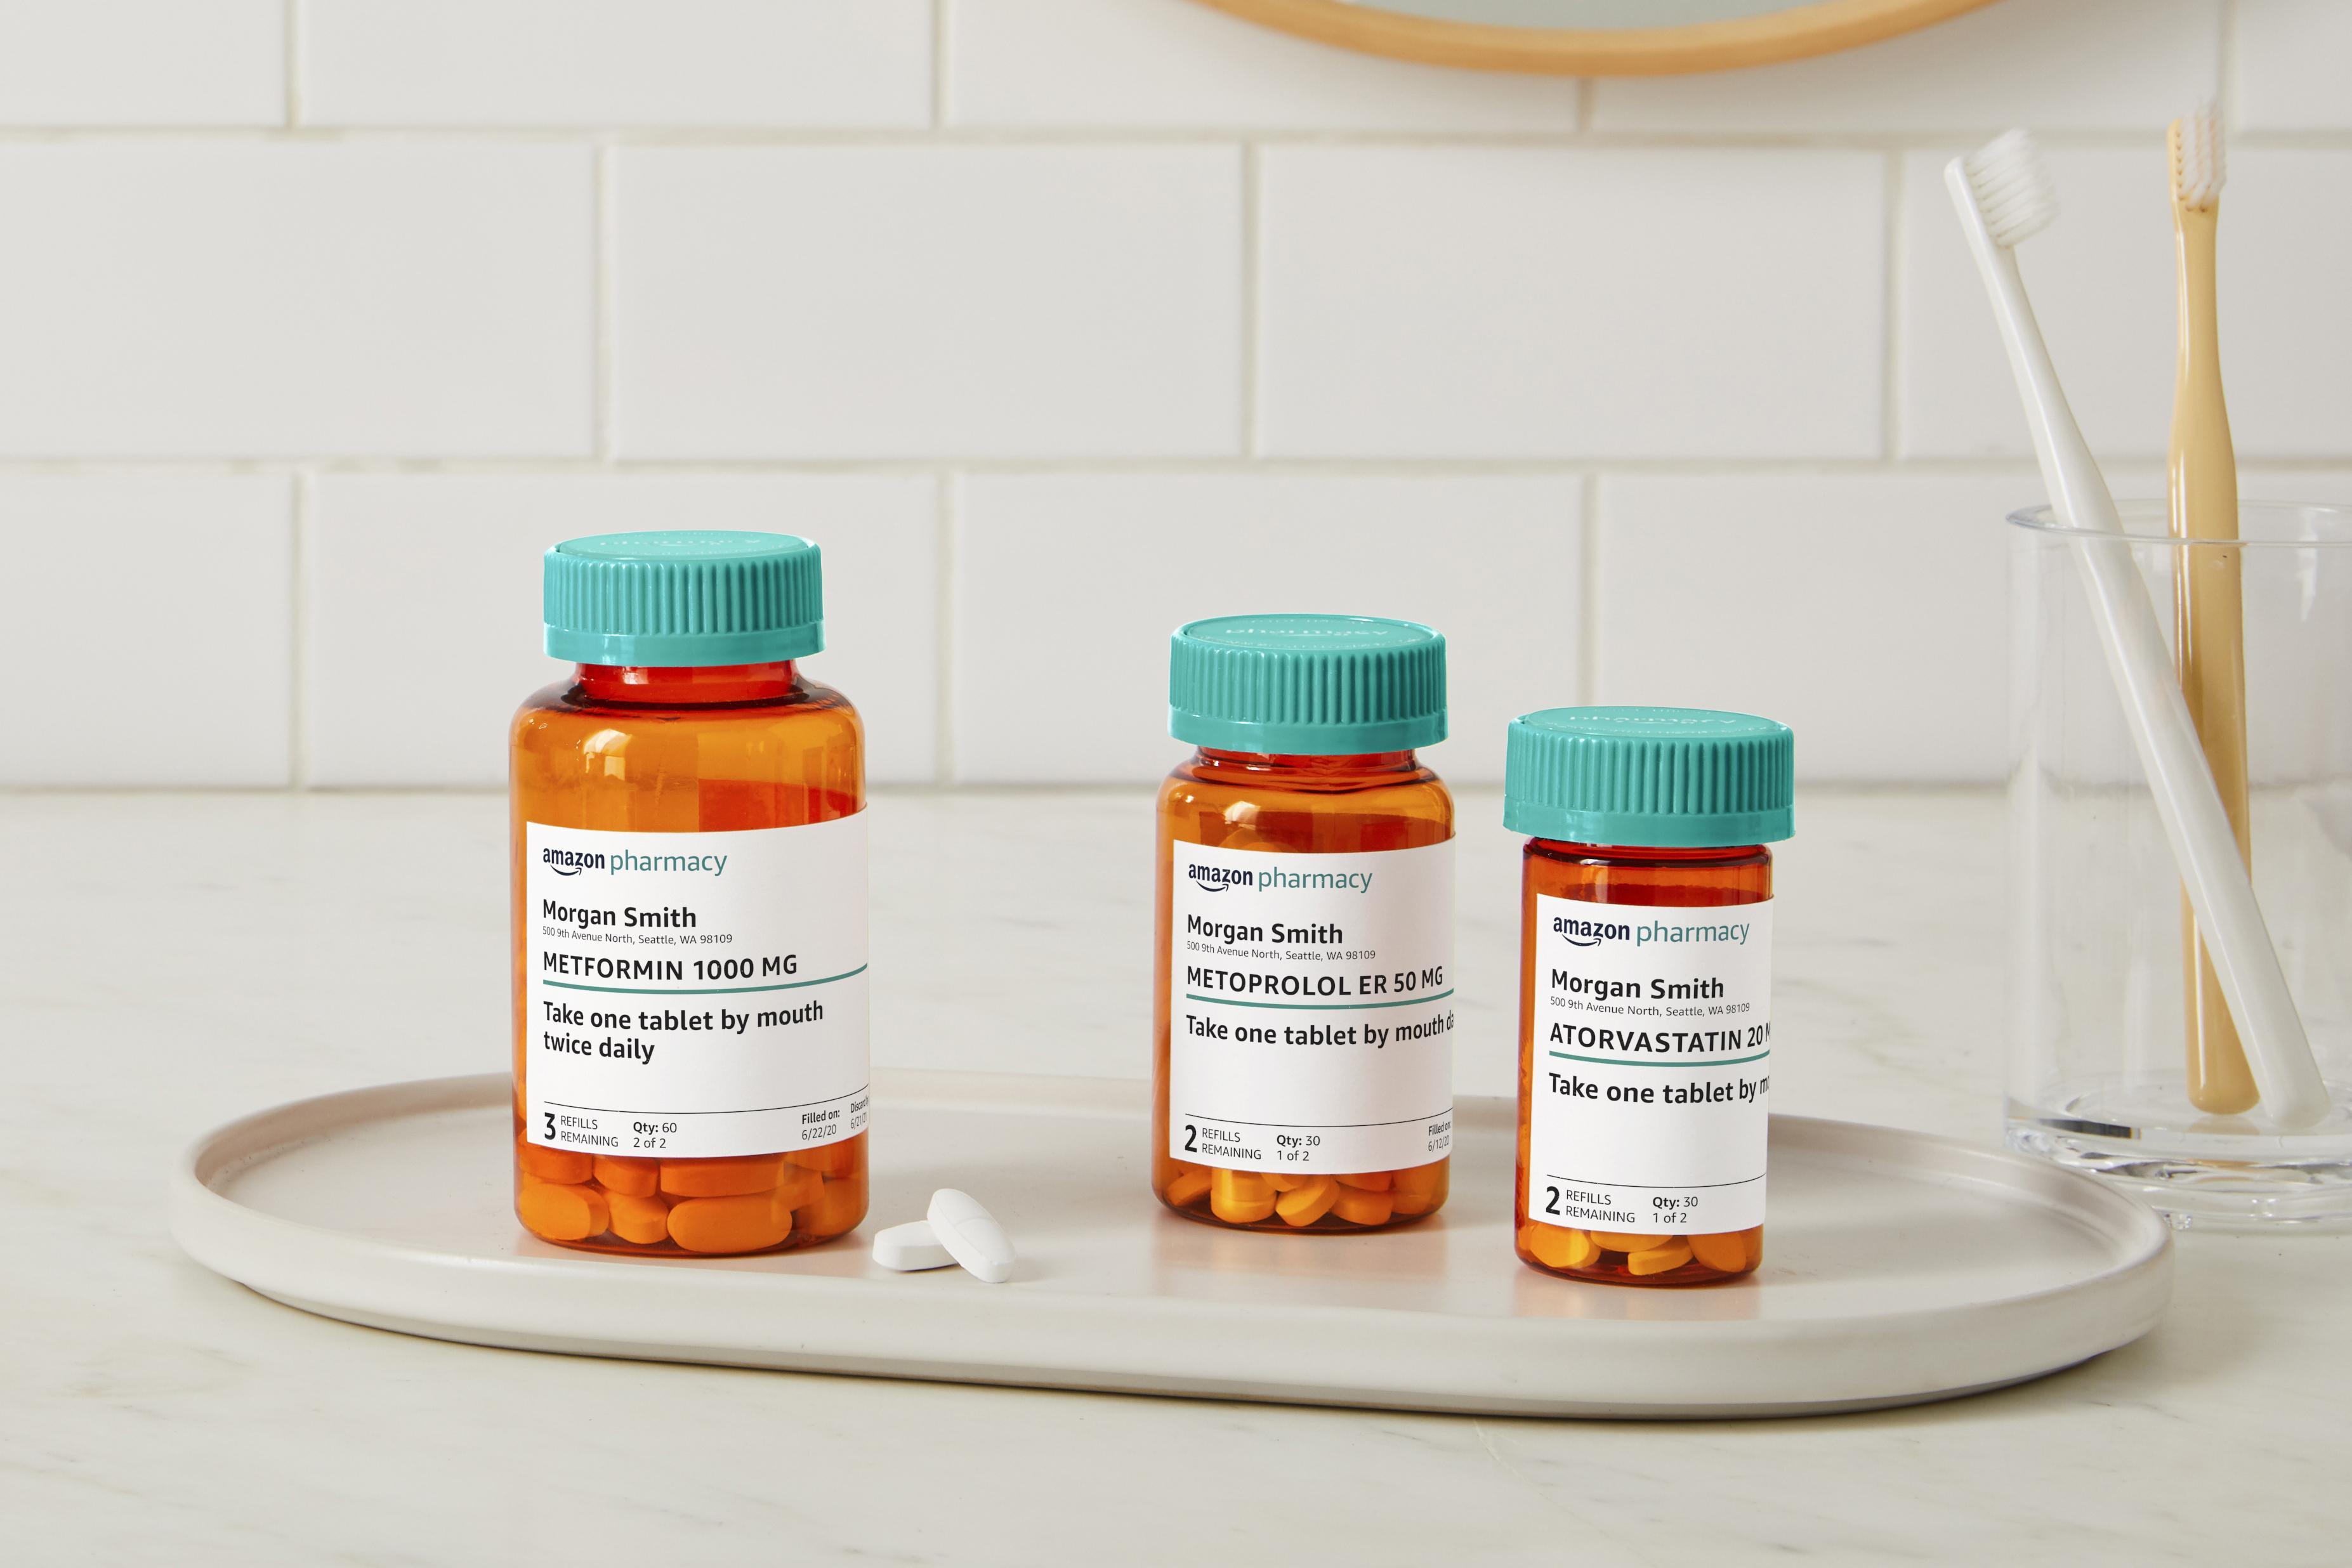 Three prescription pill bottles on a tray.